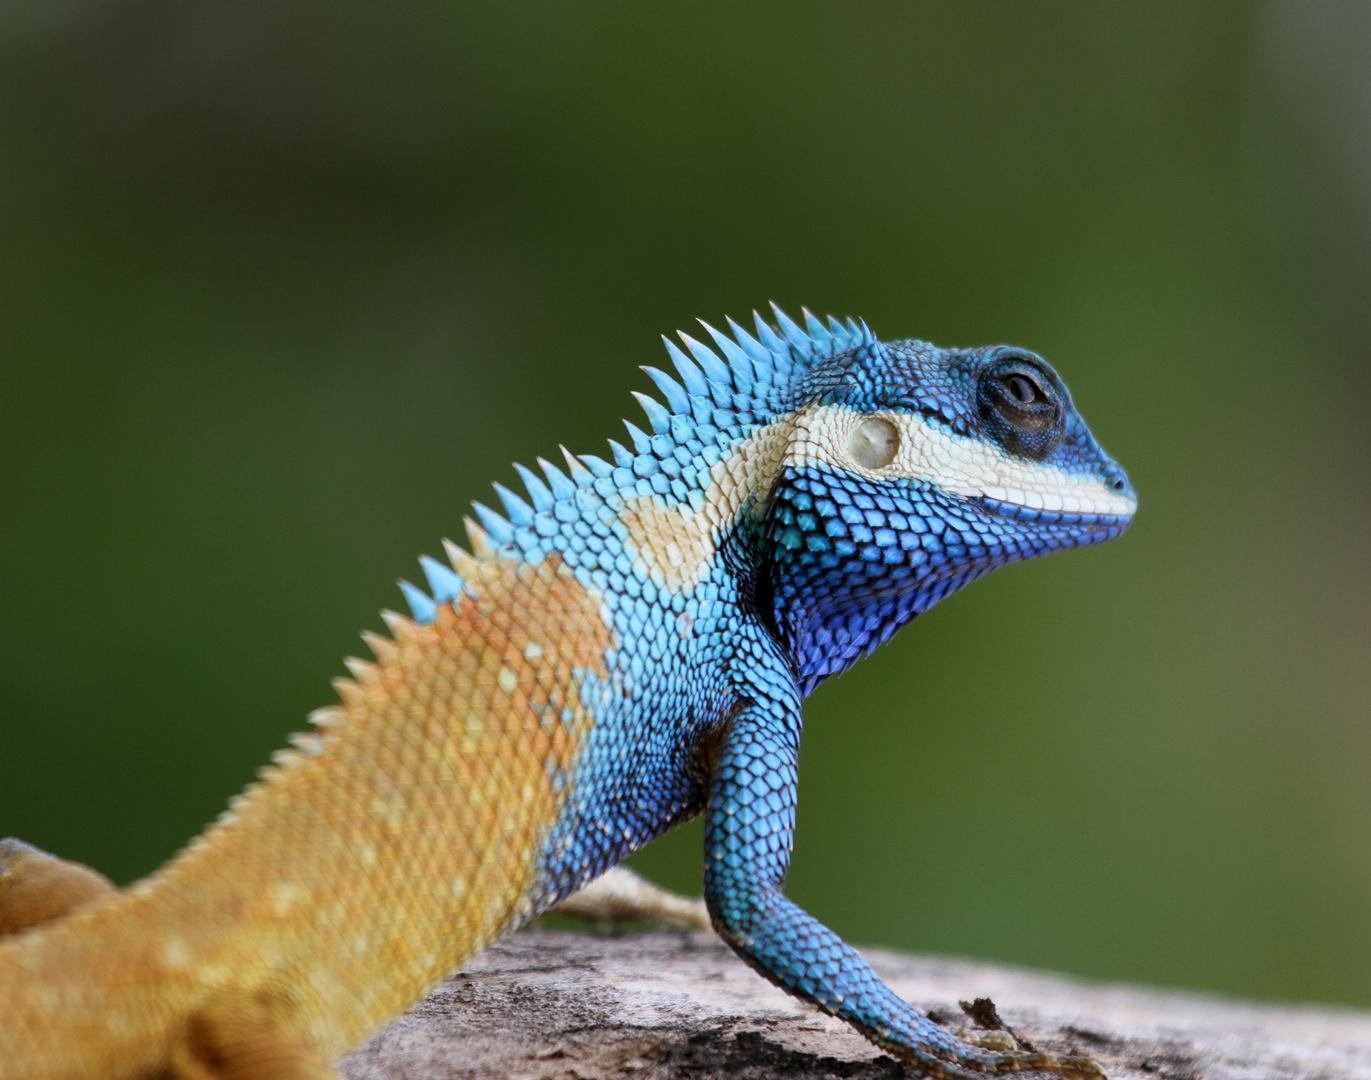 Indo-Chinese Wald Lizard